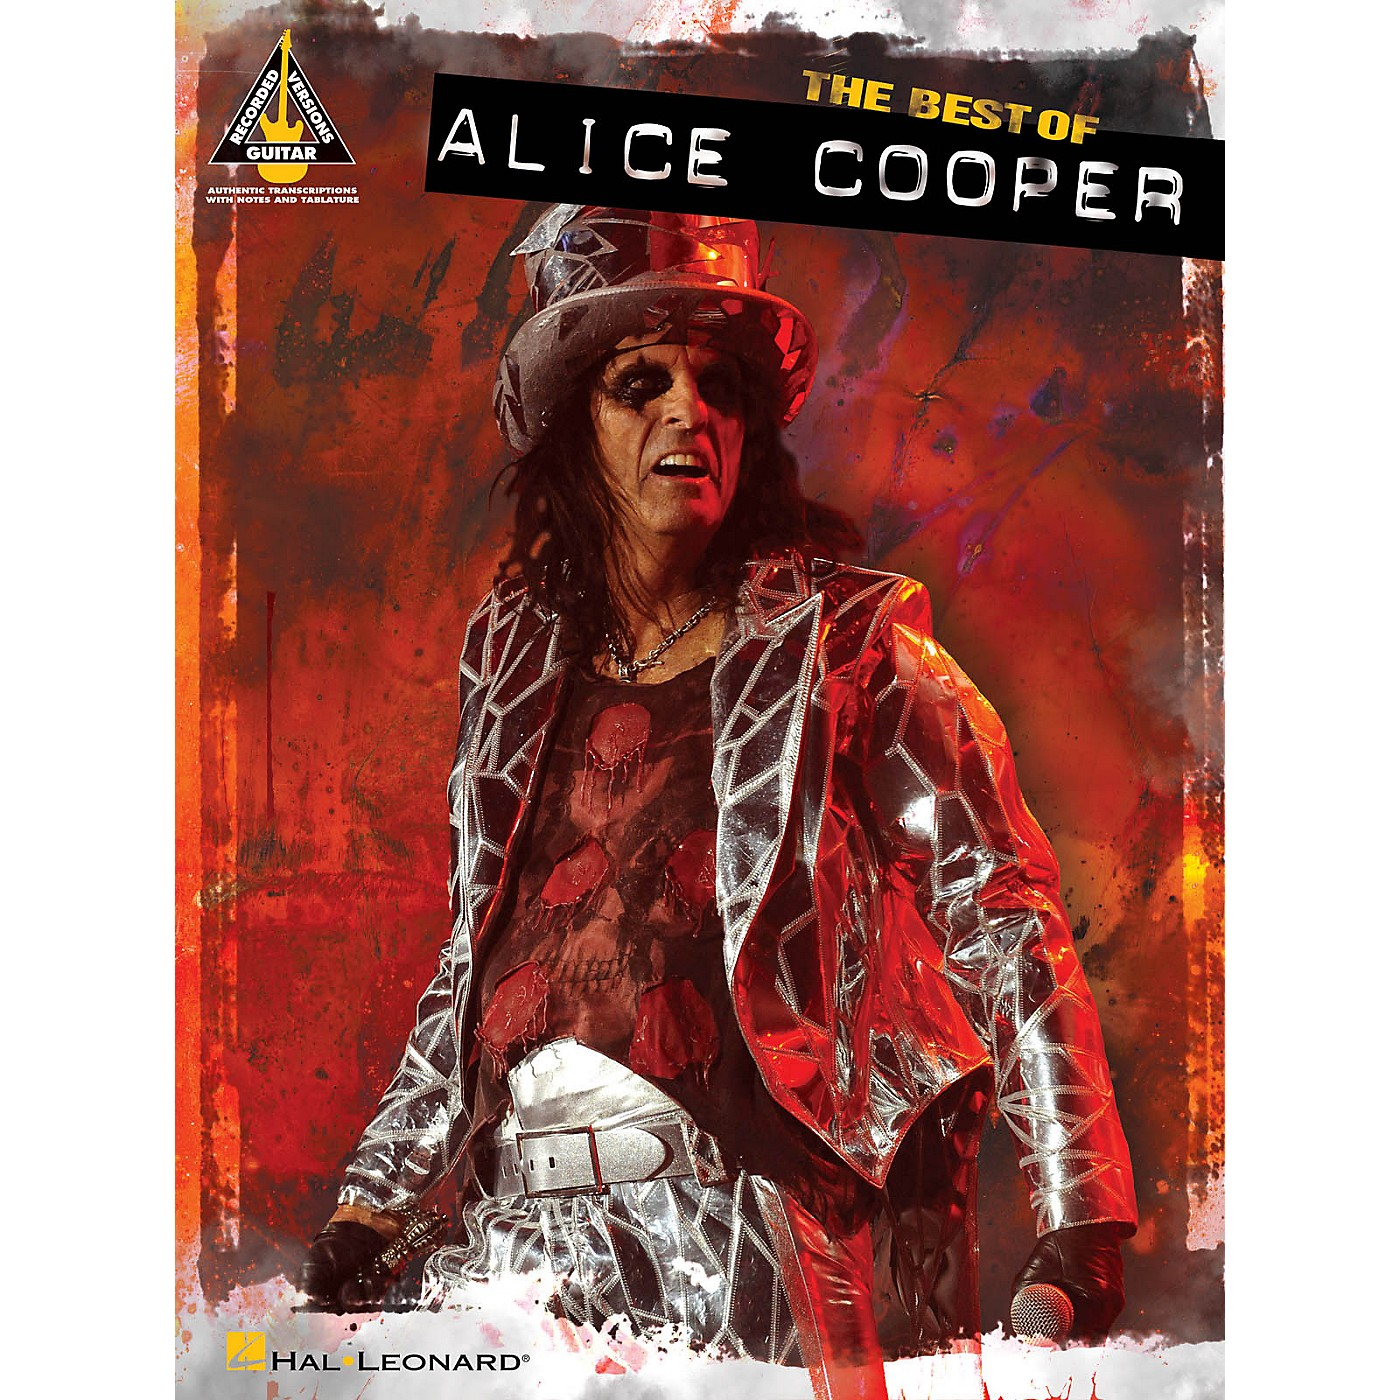 Hal Leonard Best Of Alice Cooper Guitar Tab Songbook thumbnail